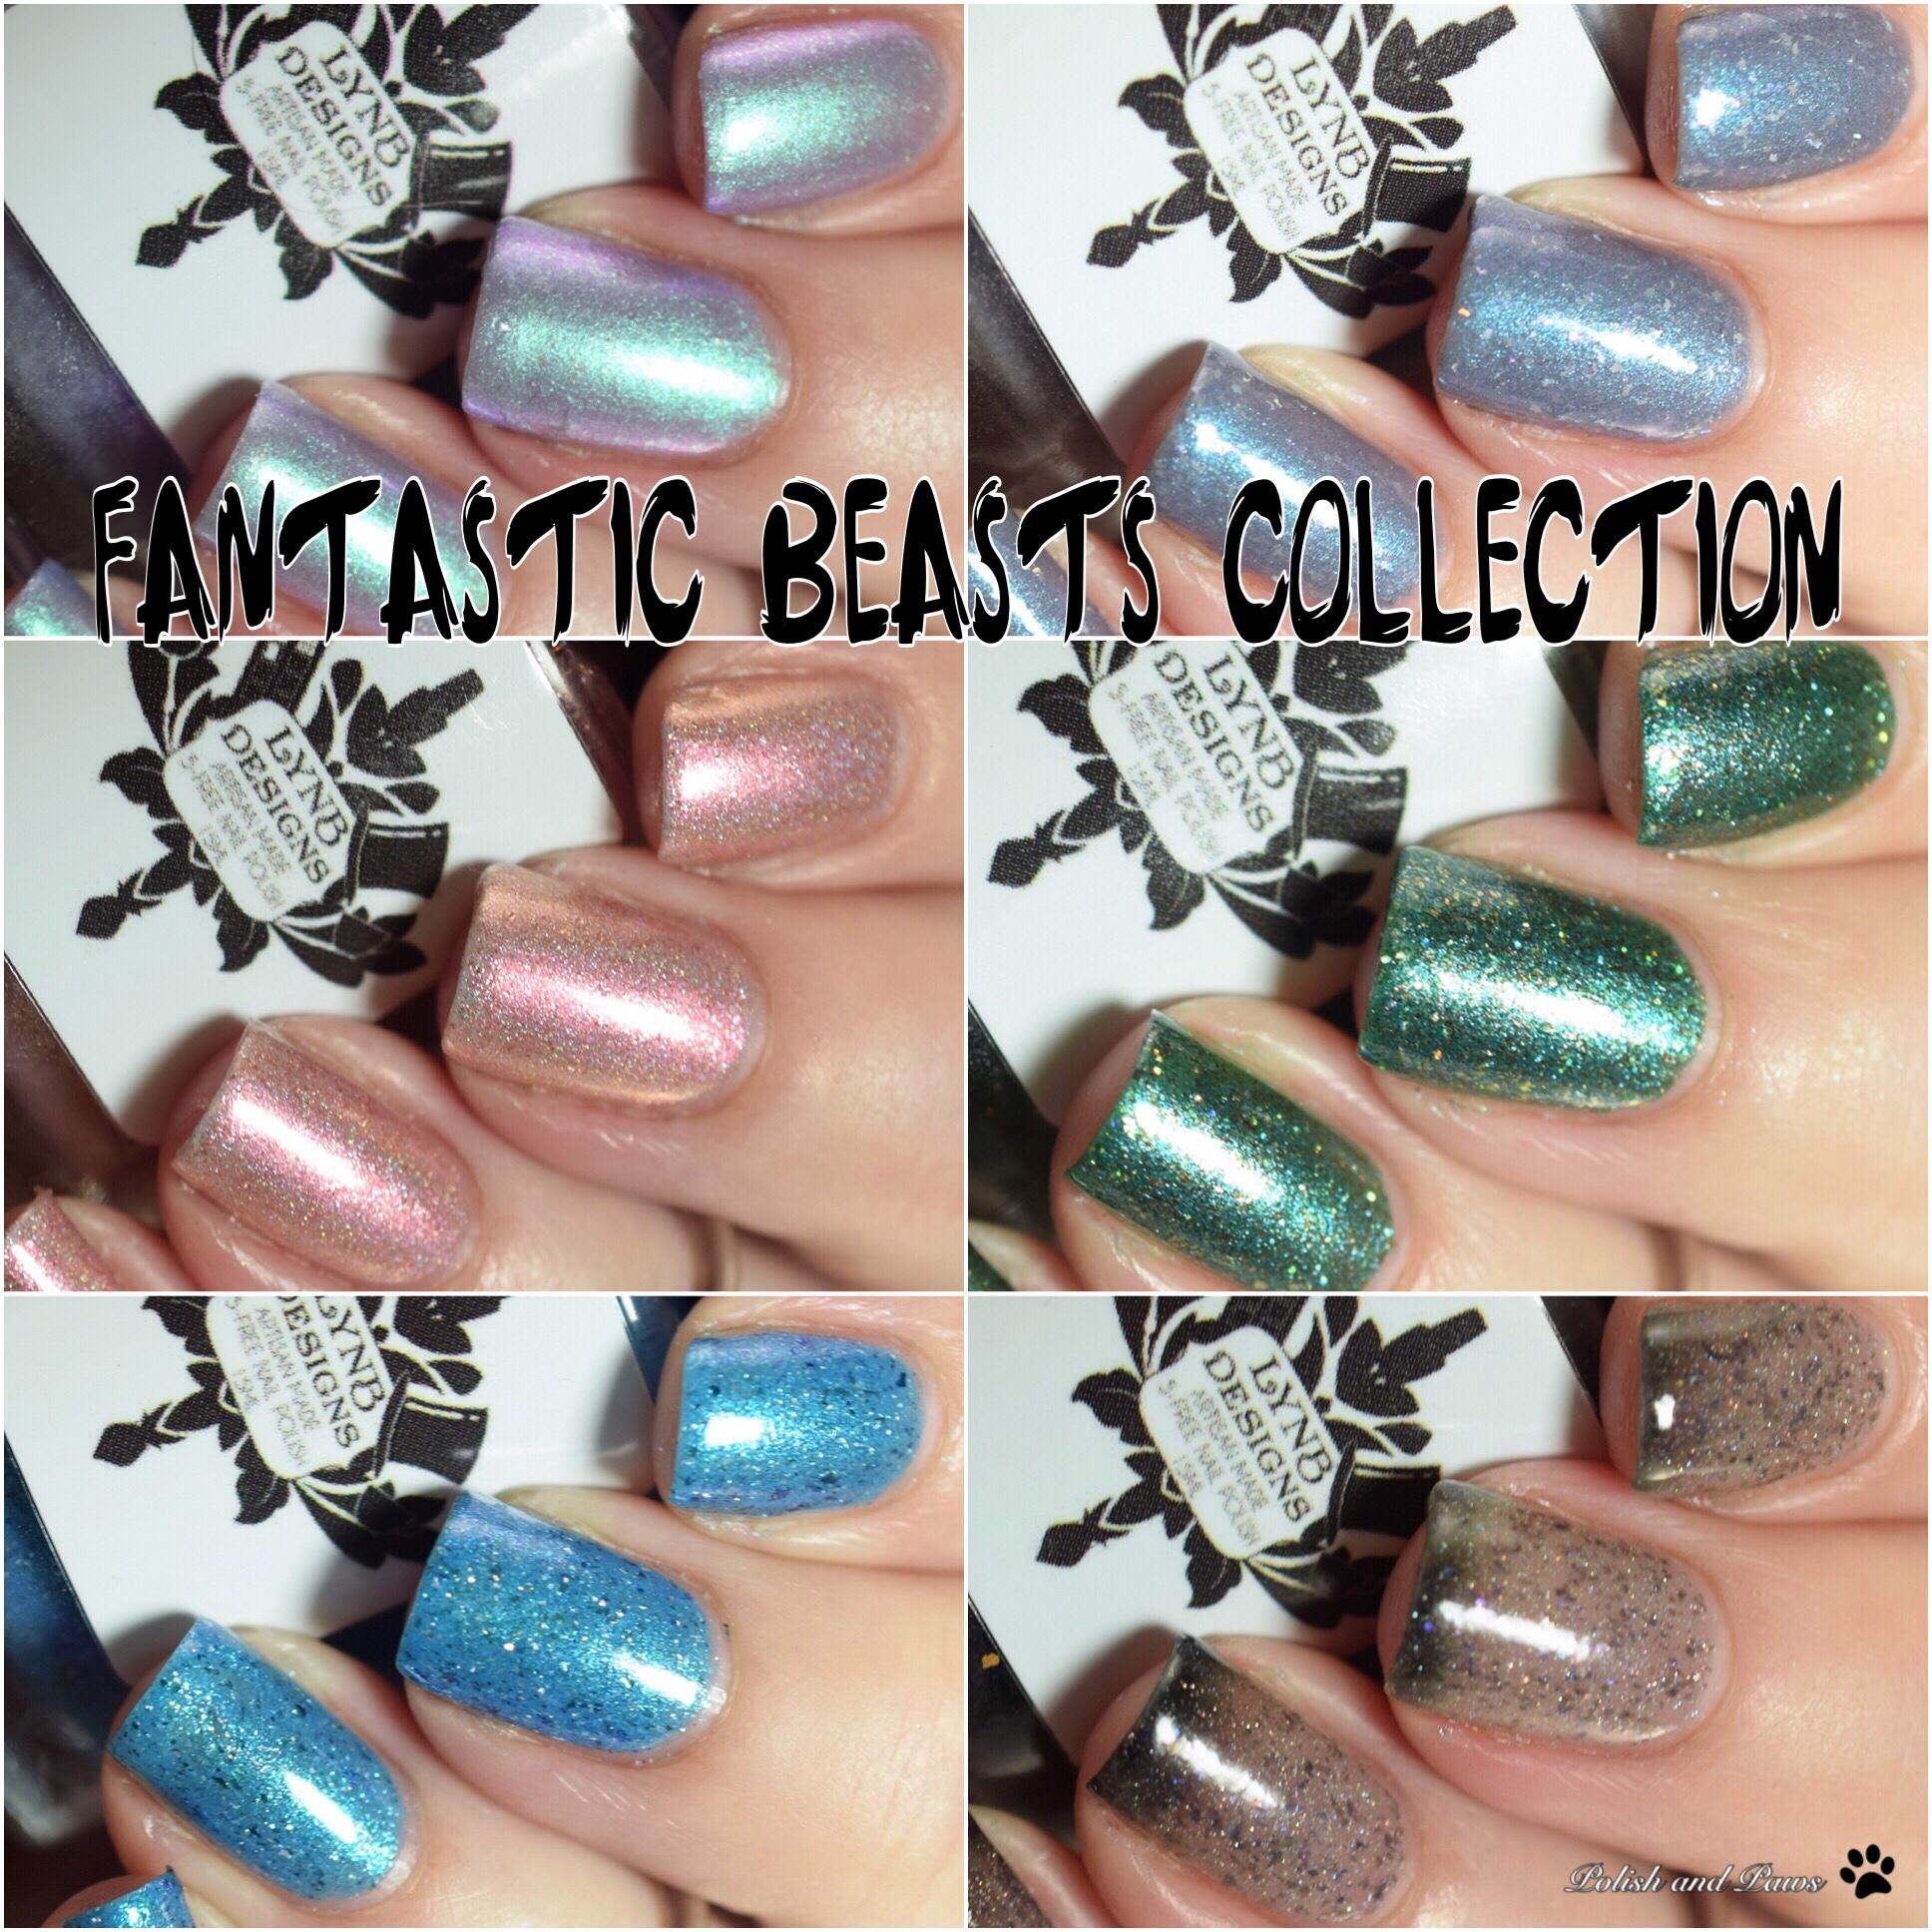 LynB Designs Fantastic Creatures Collection